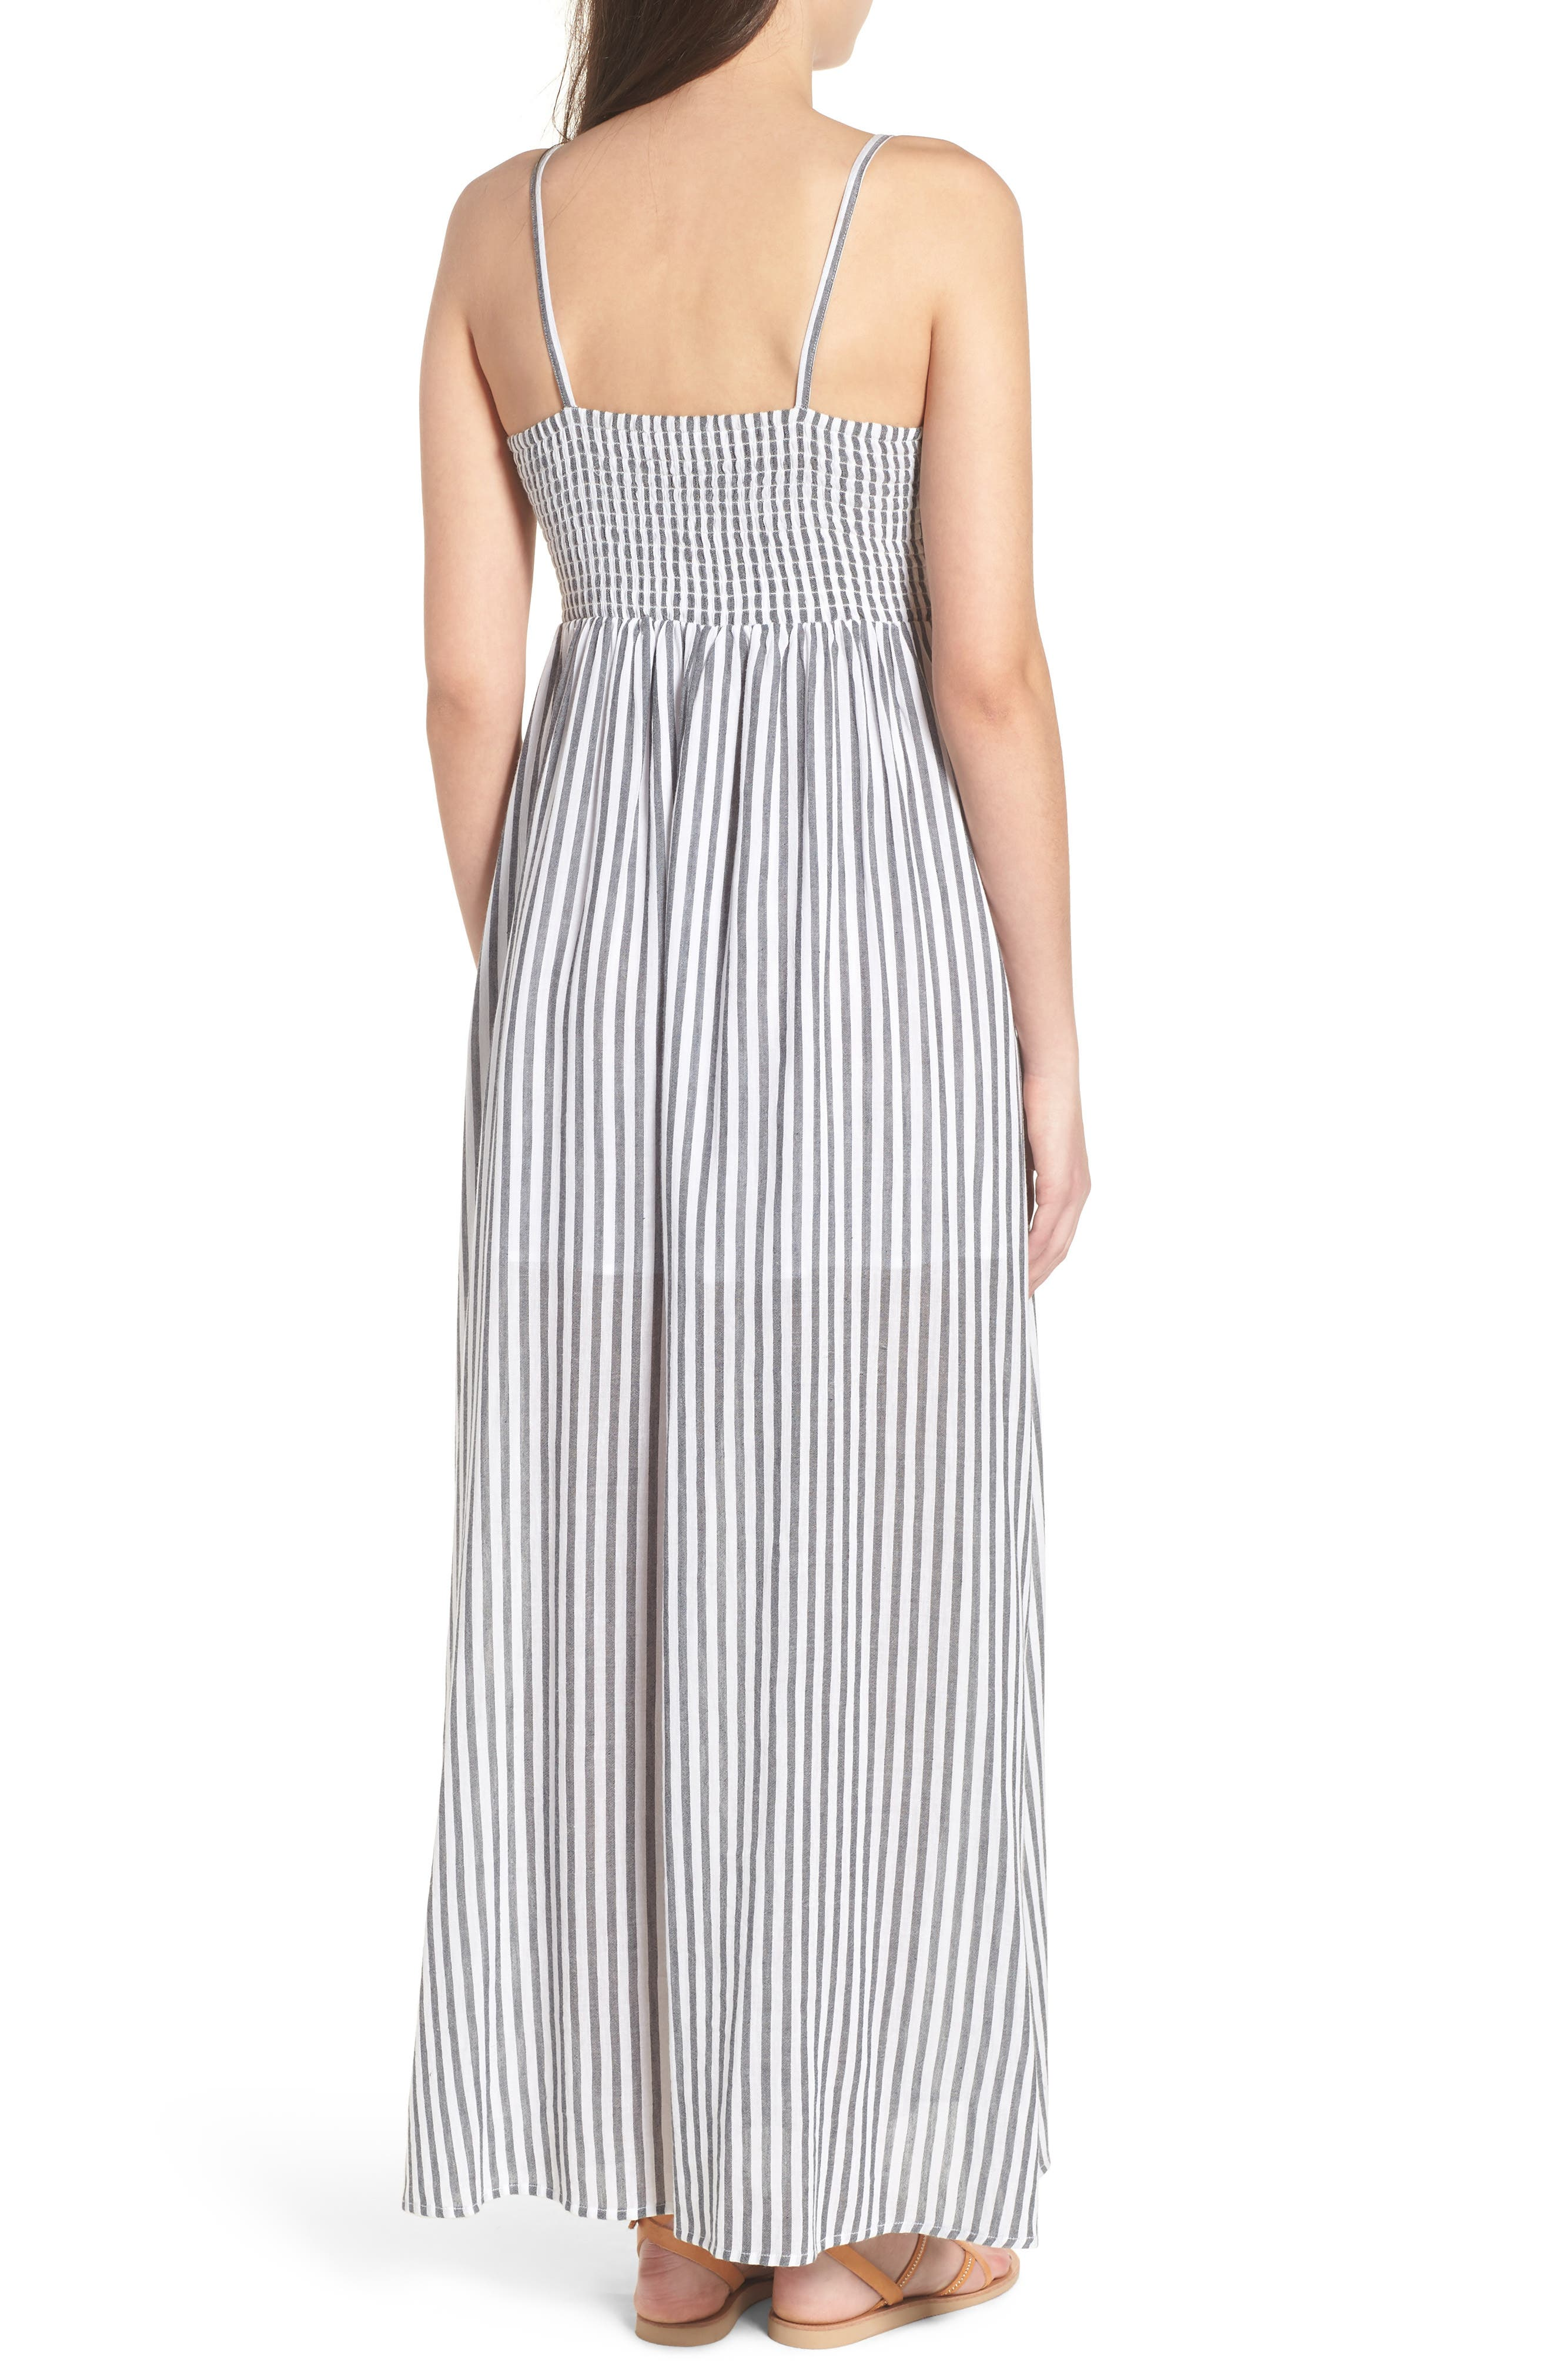 Stripe Button Front Maxi Dress,                             Alternate thumbnail 2, color,                             White City Stripe